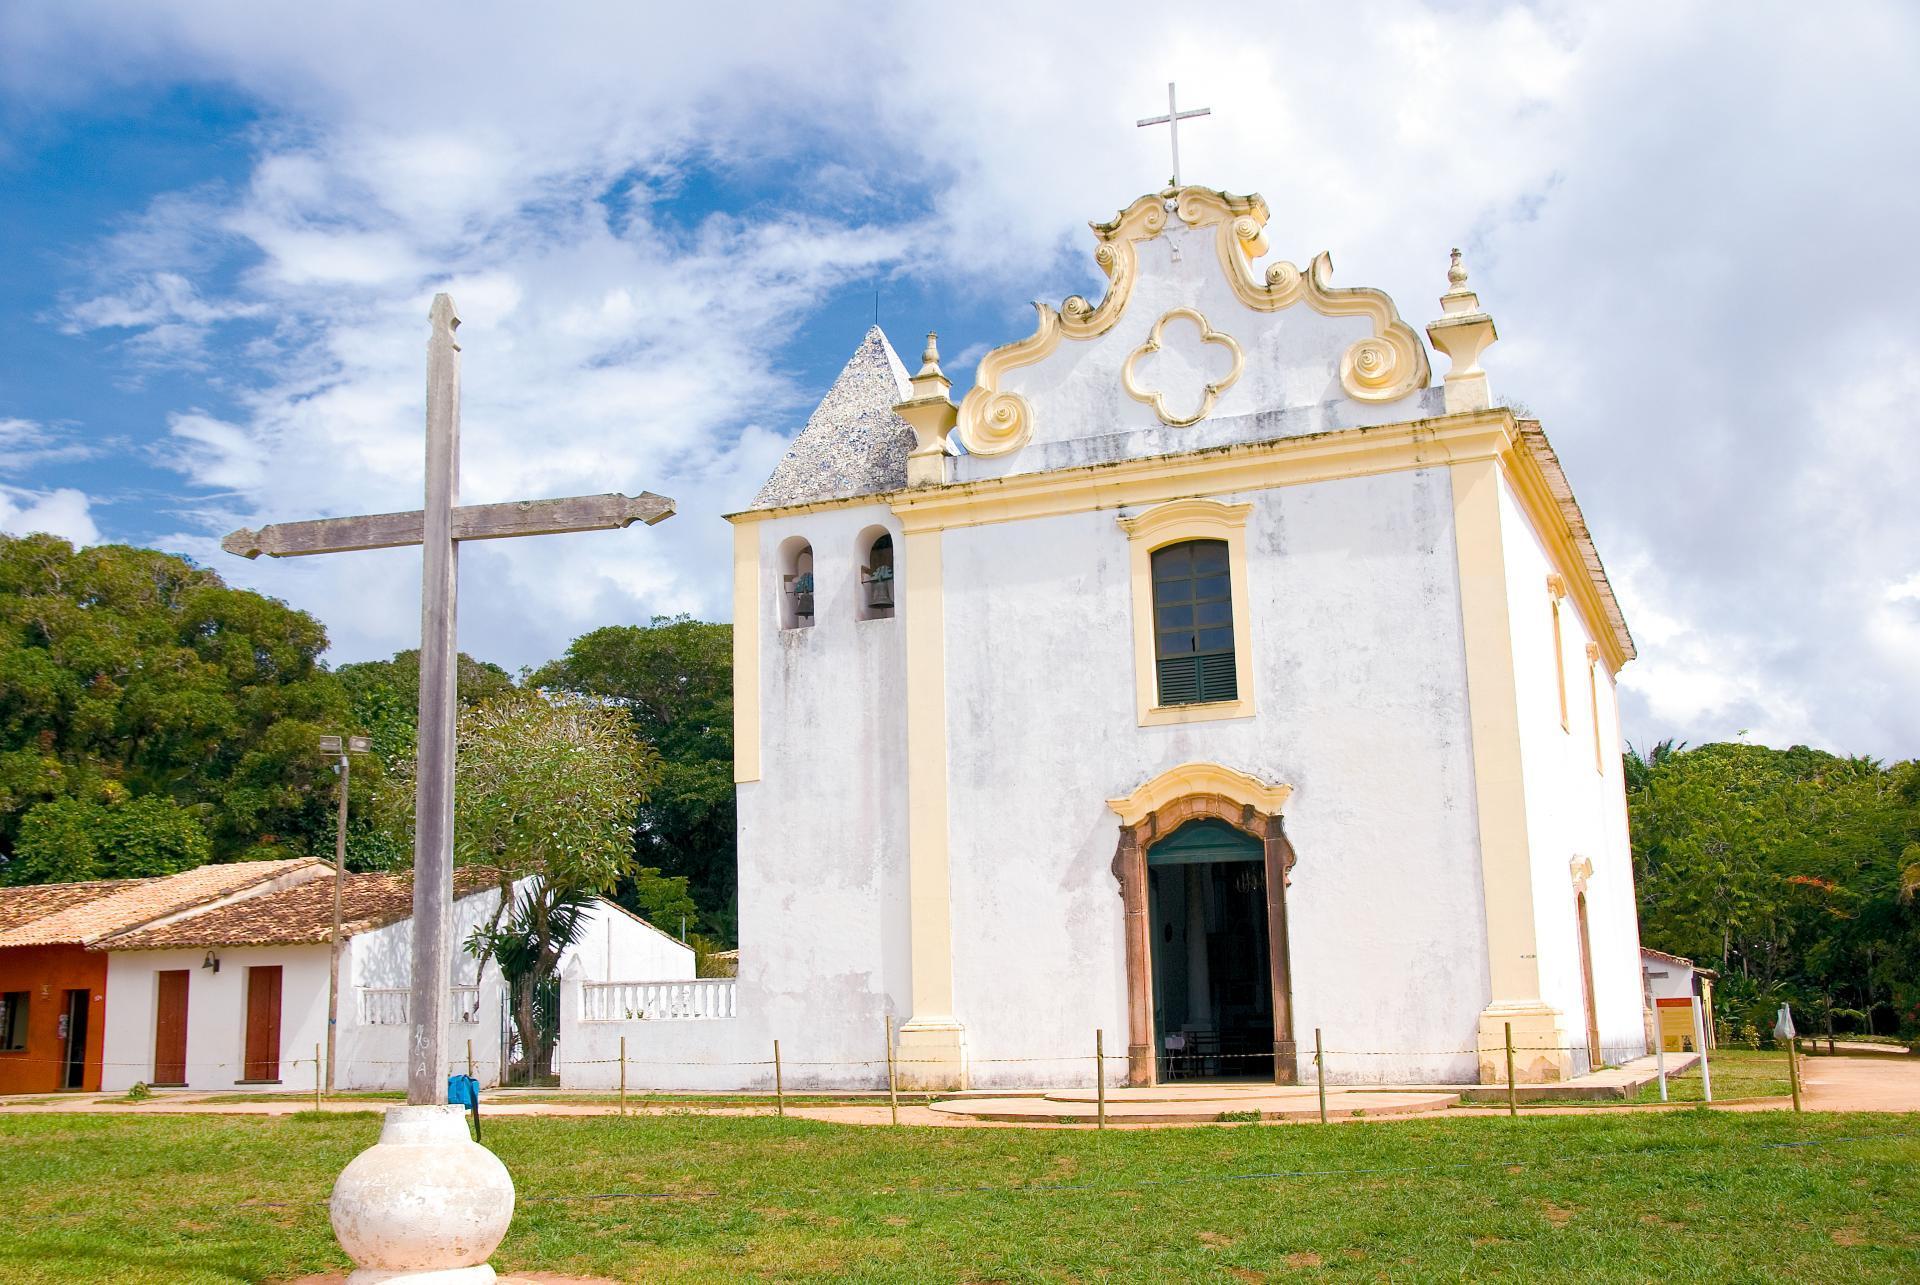 Easter: Cross and Church in Bahia